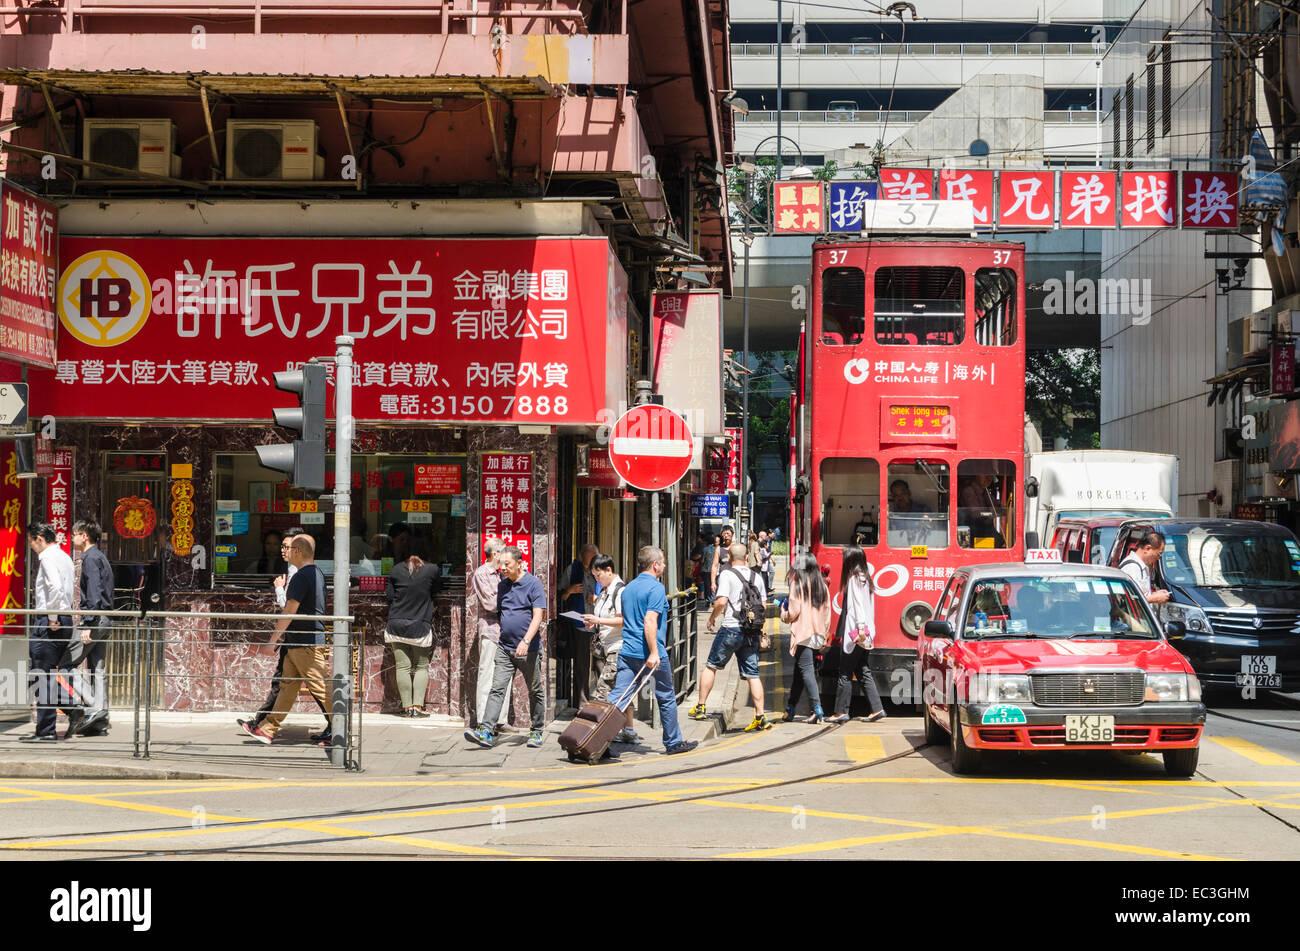 Busy Hong Kong Island street scene in Sheung Wan, Hong Kong, China - Stock Image